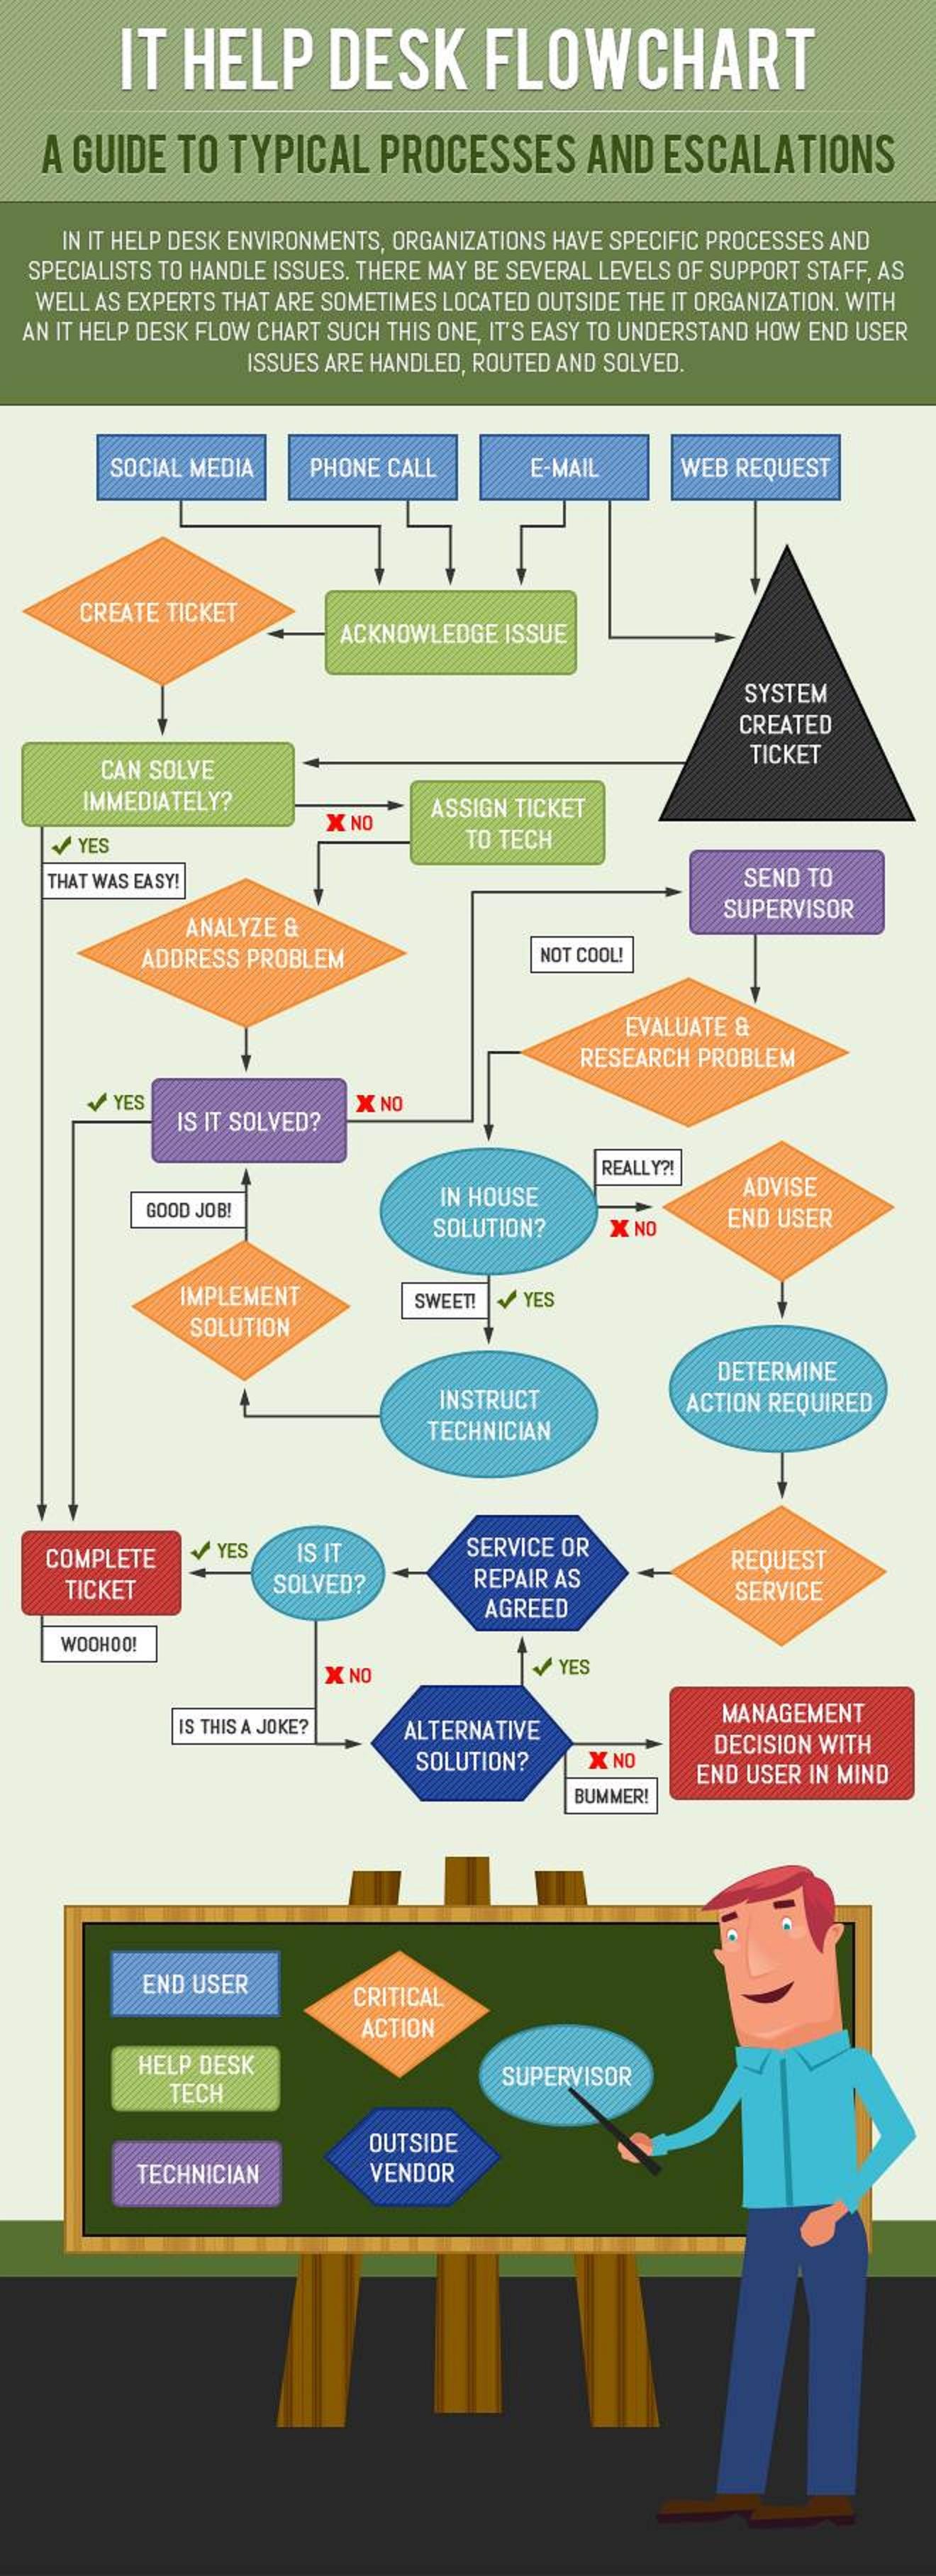 IT Help Desk Flowchart [INFOGRAPHIC] – Infographic List